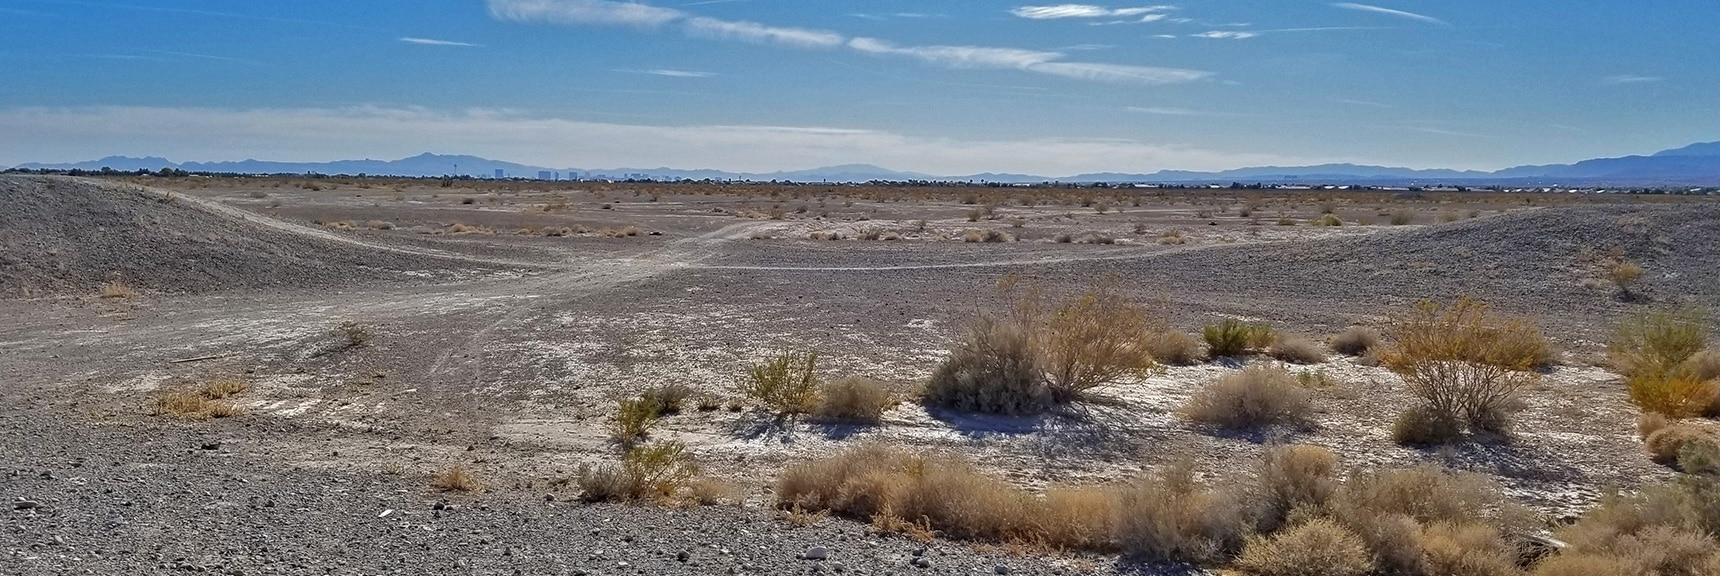 Heading South Across the Desert Back Toward Silverstone Estates   Centennial Hills Mountain Bike Conditioning Adventure Loop, Las Vegas, Nevada